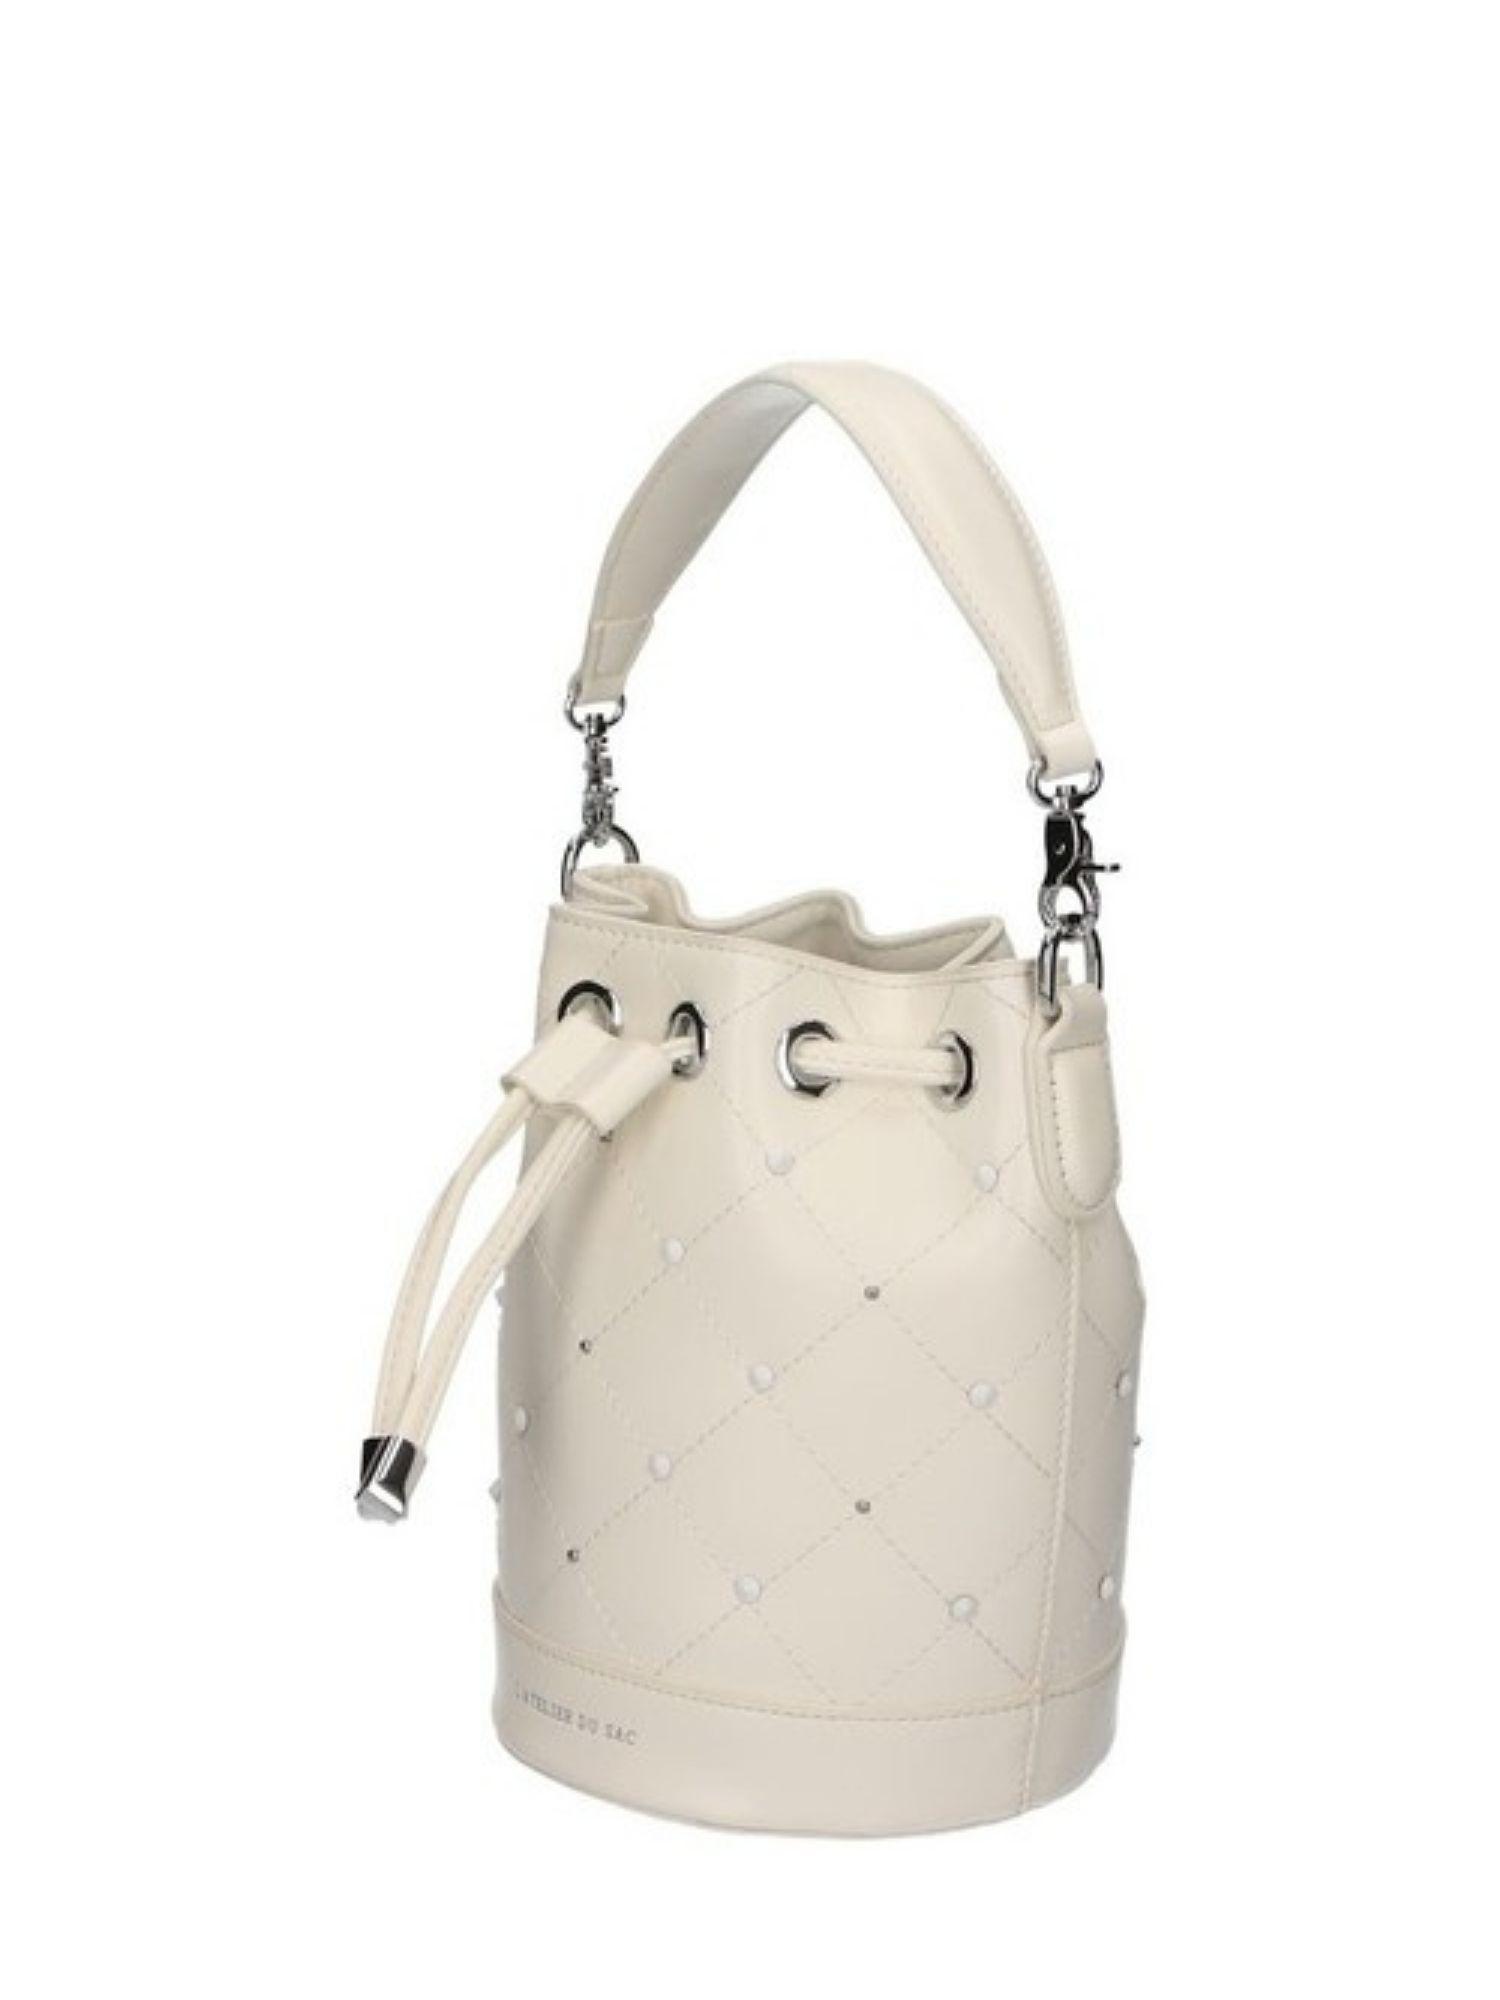 Borsa secchiello Atelier Du Sac Pash Bag 10964 Bianco 1